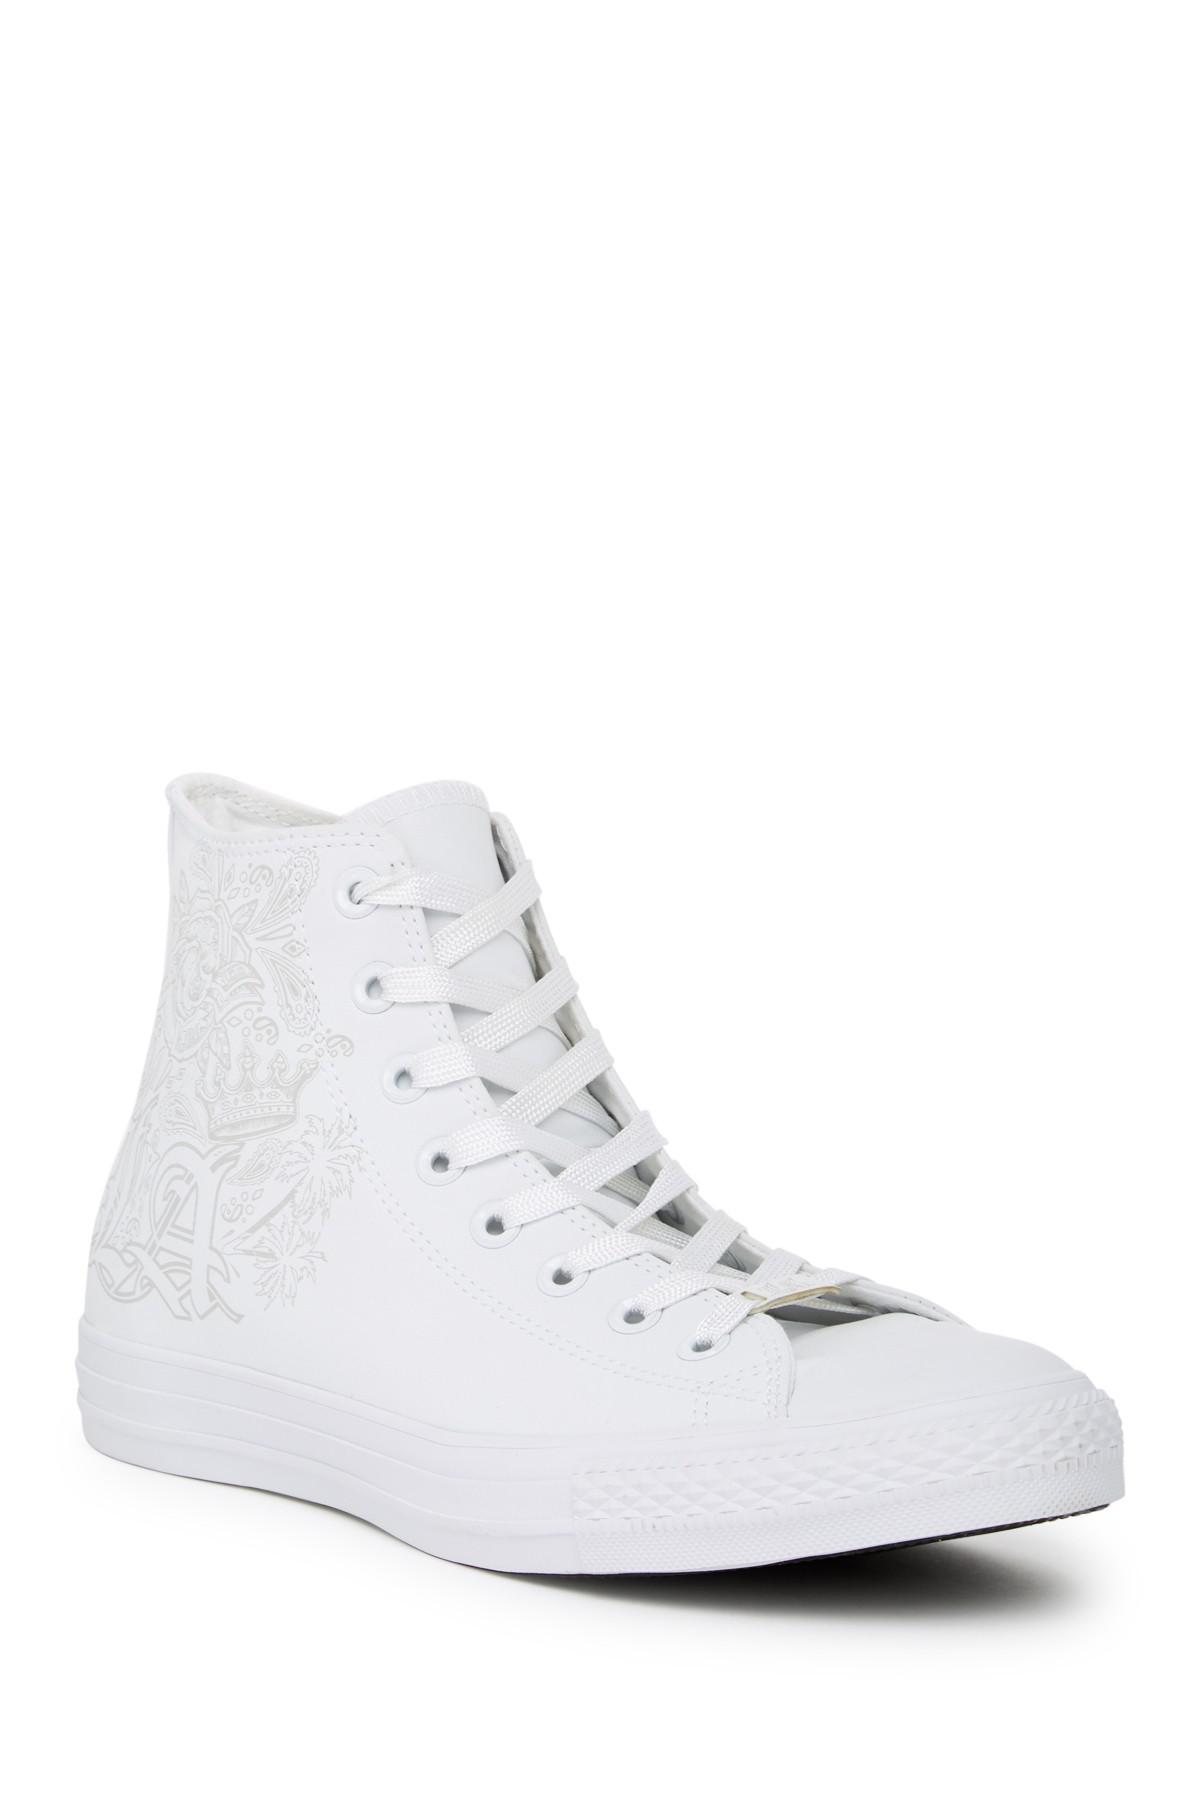 2af2da8b888 Lyst - Converse Embossed High Top Sneaker in White